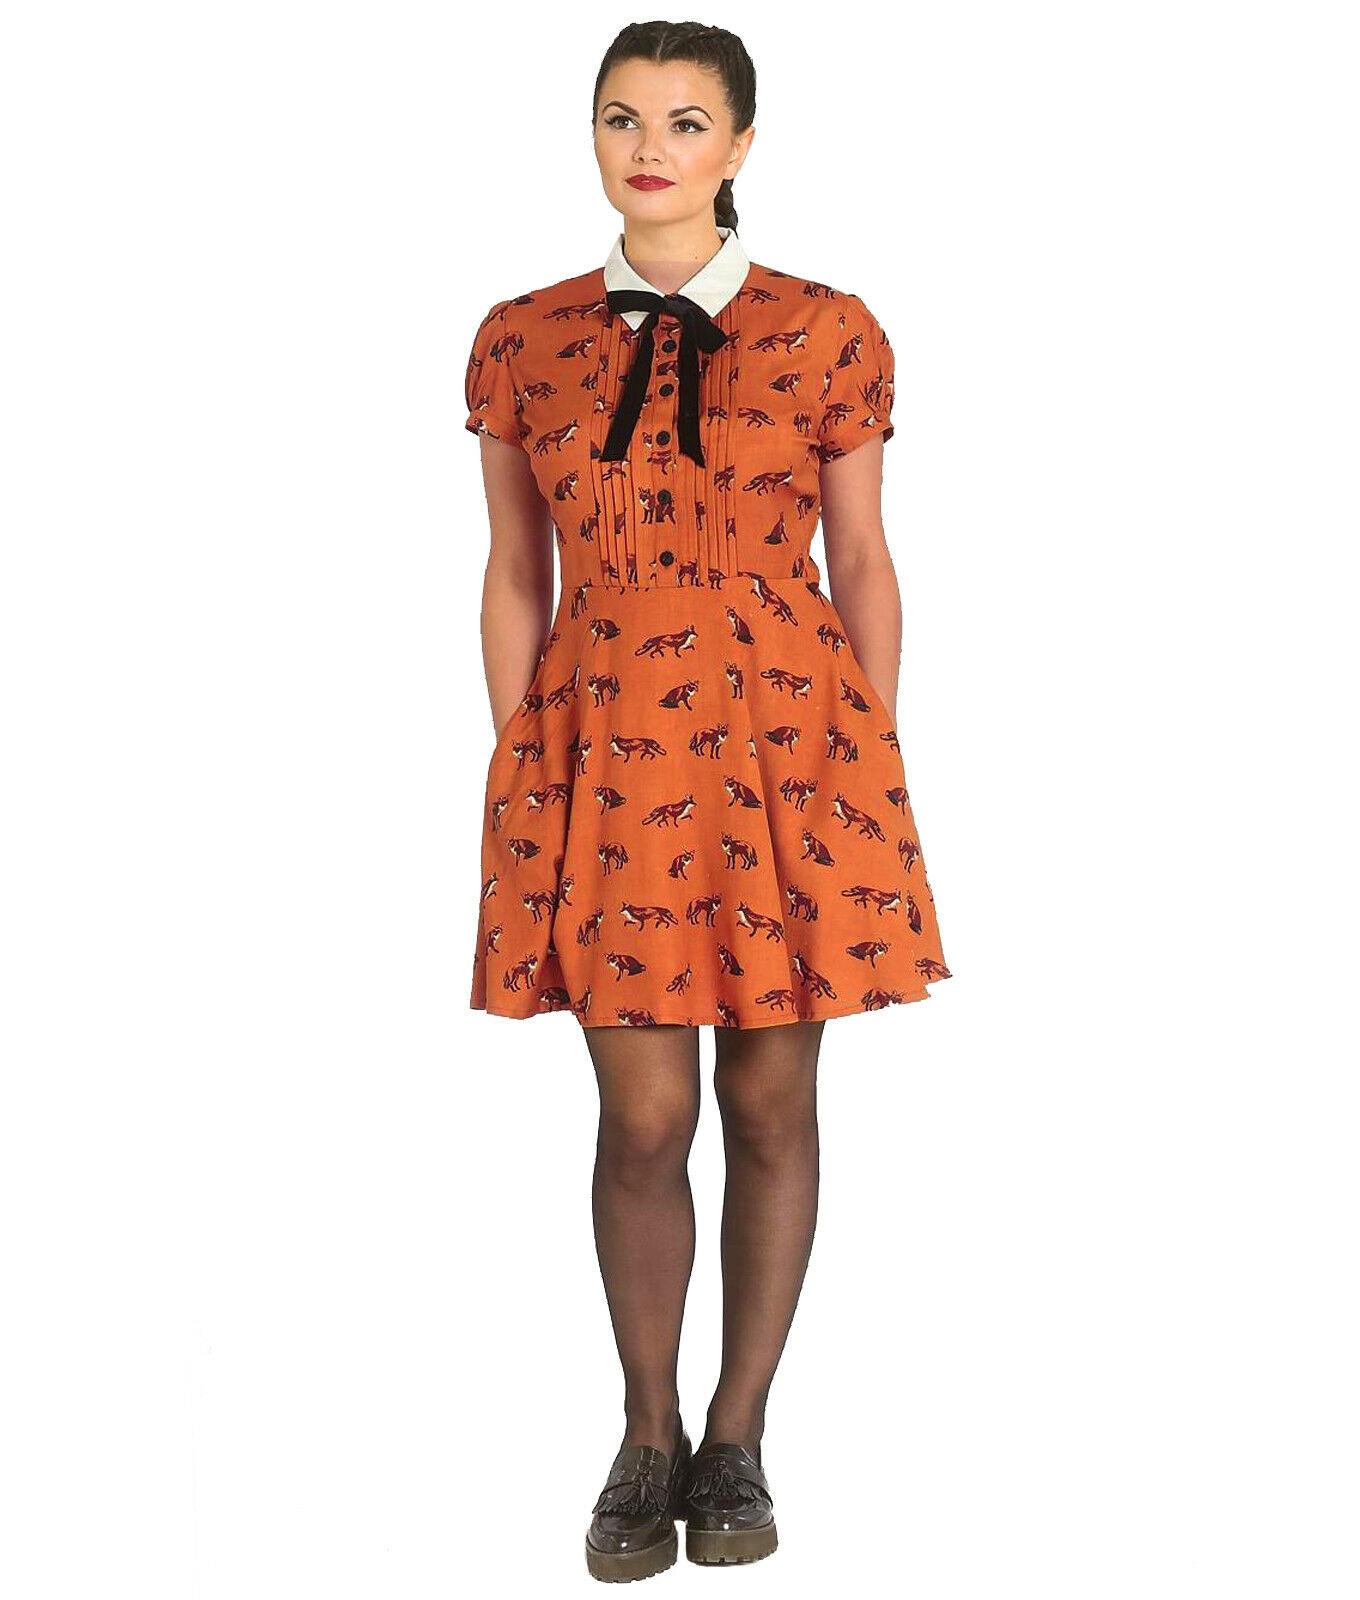 Hell-Bunny-40s-50s-Brown-Mini-Dress-Pin-Up-VIXEY-Vixen-Fox-Print-All-Sizes thumbnail 3